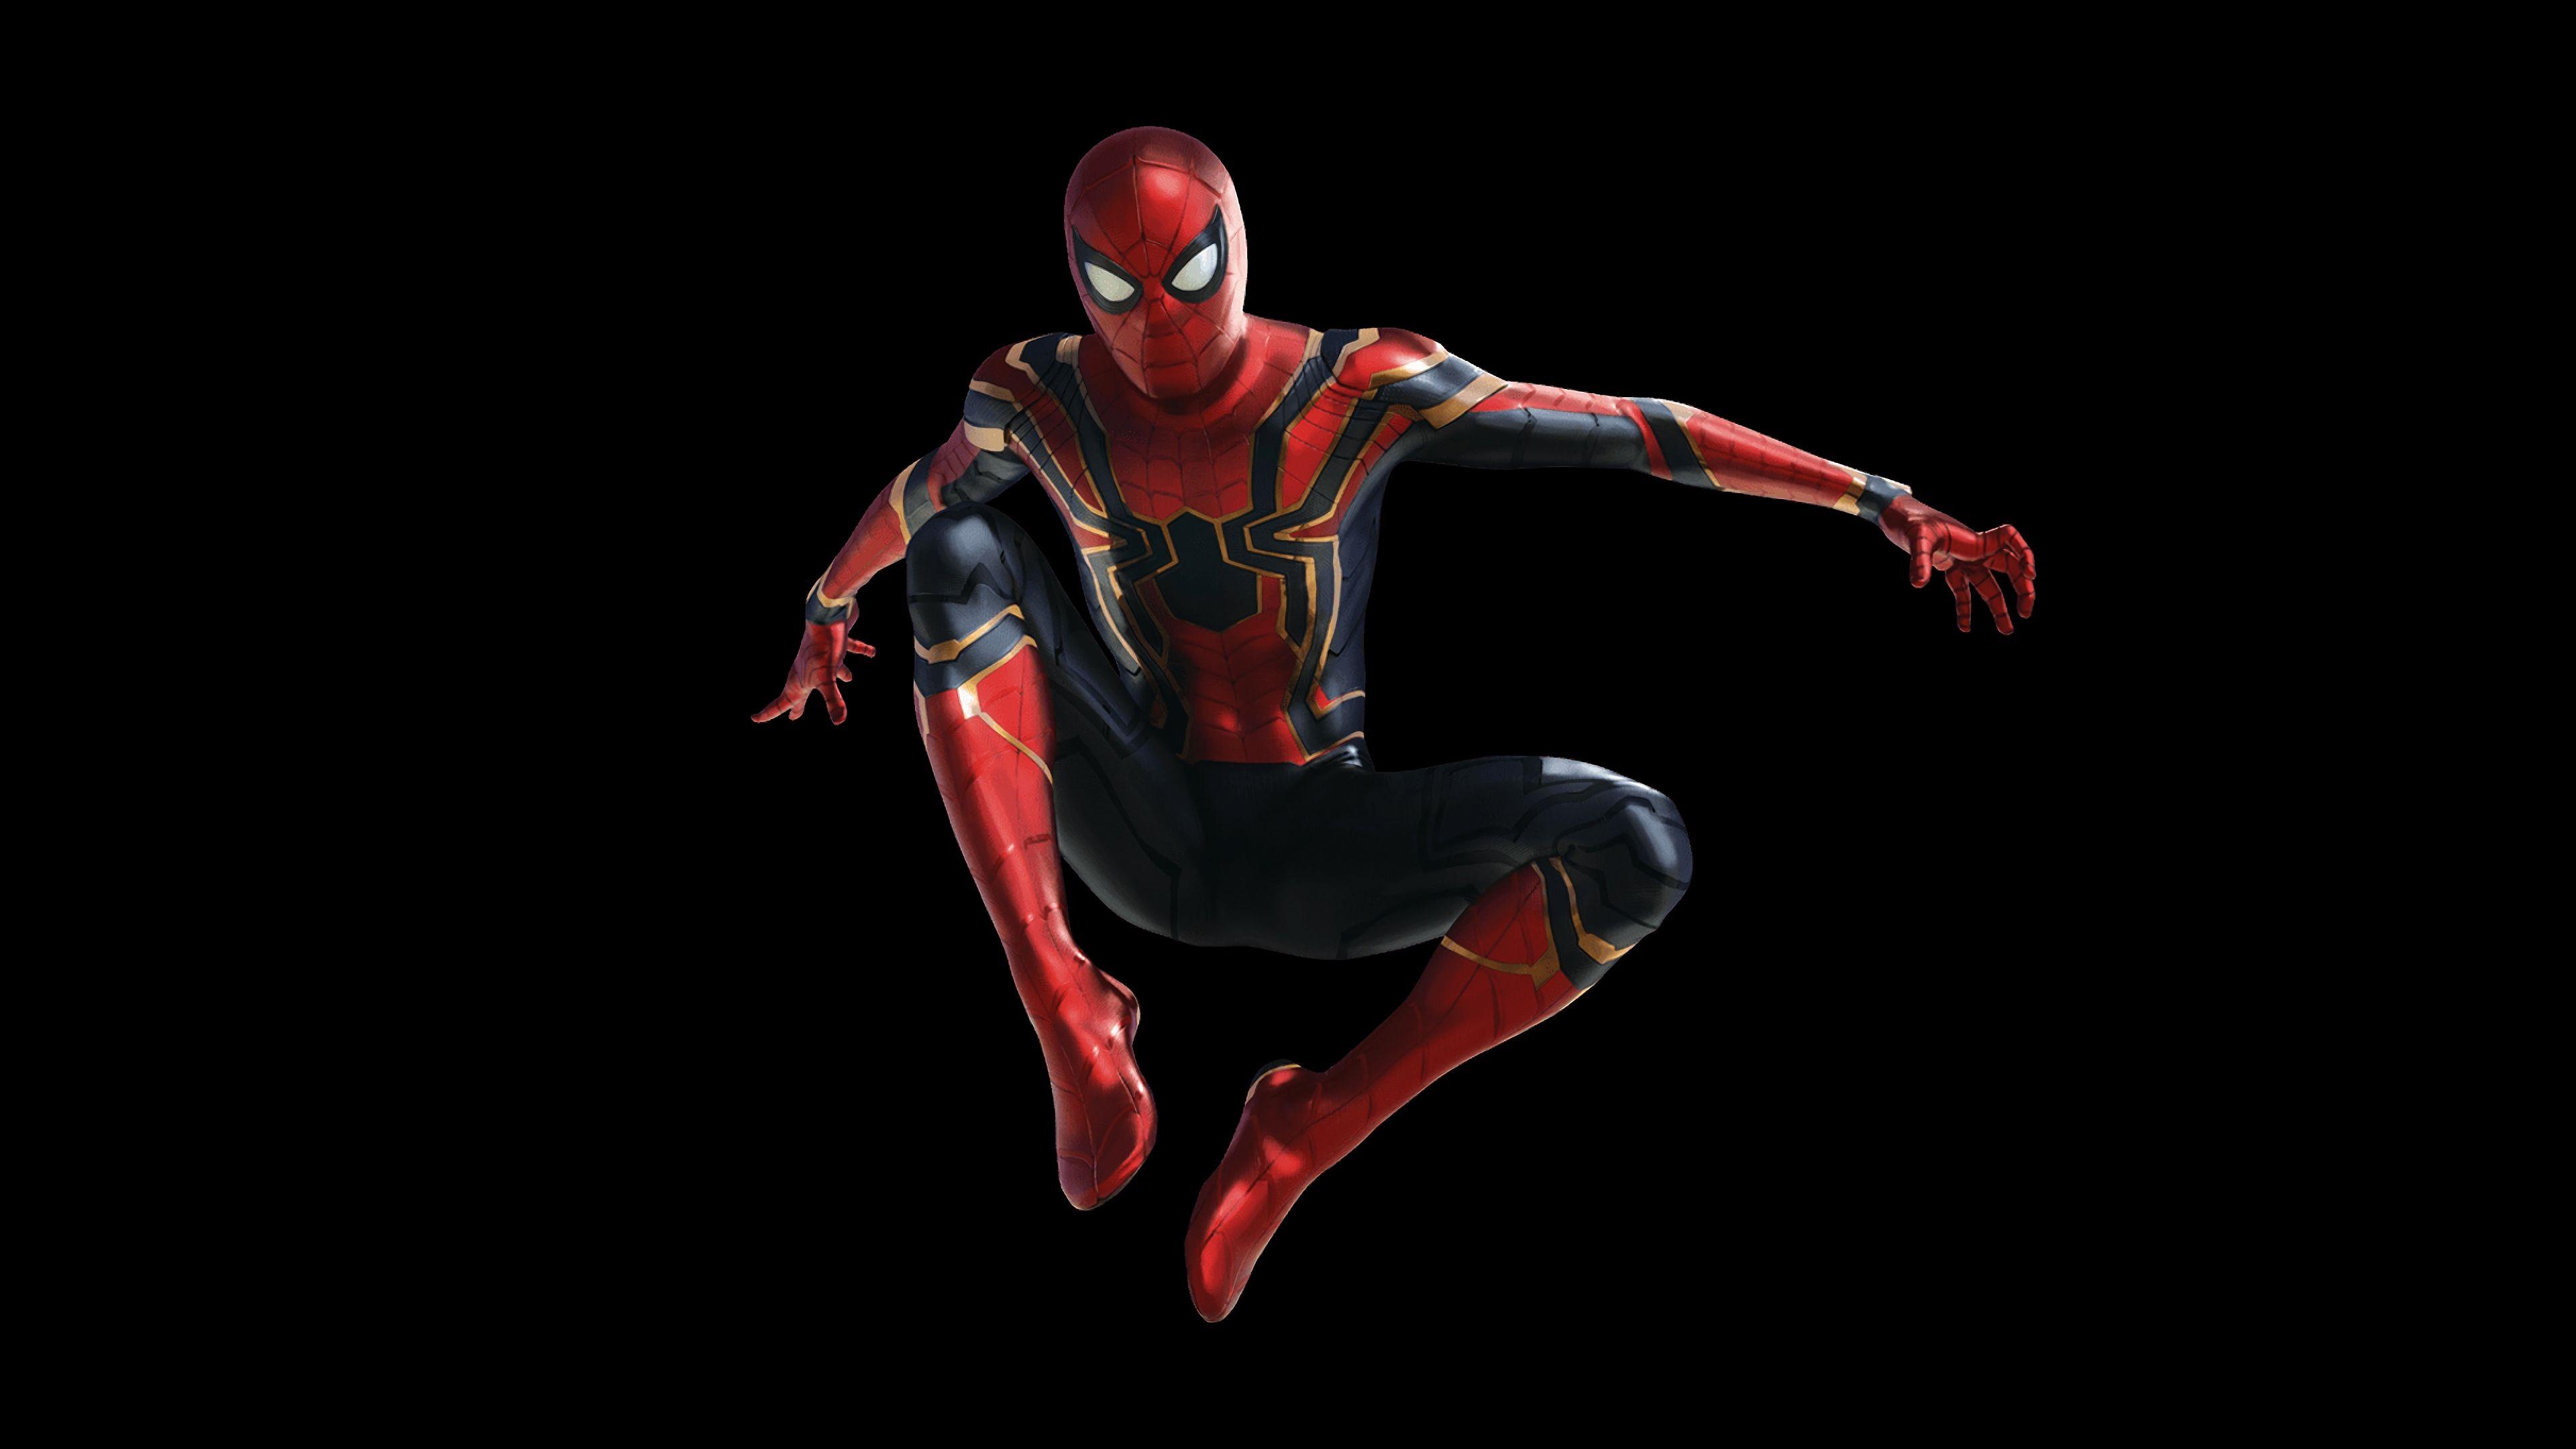 Spider Man Iron Spider Avengers Infinity War Movie 2018 3840x2160 Wallpaper Spiderman Spiderman Pictures Avengers Infinity War